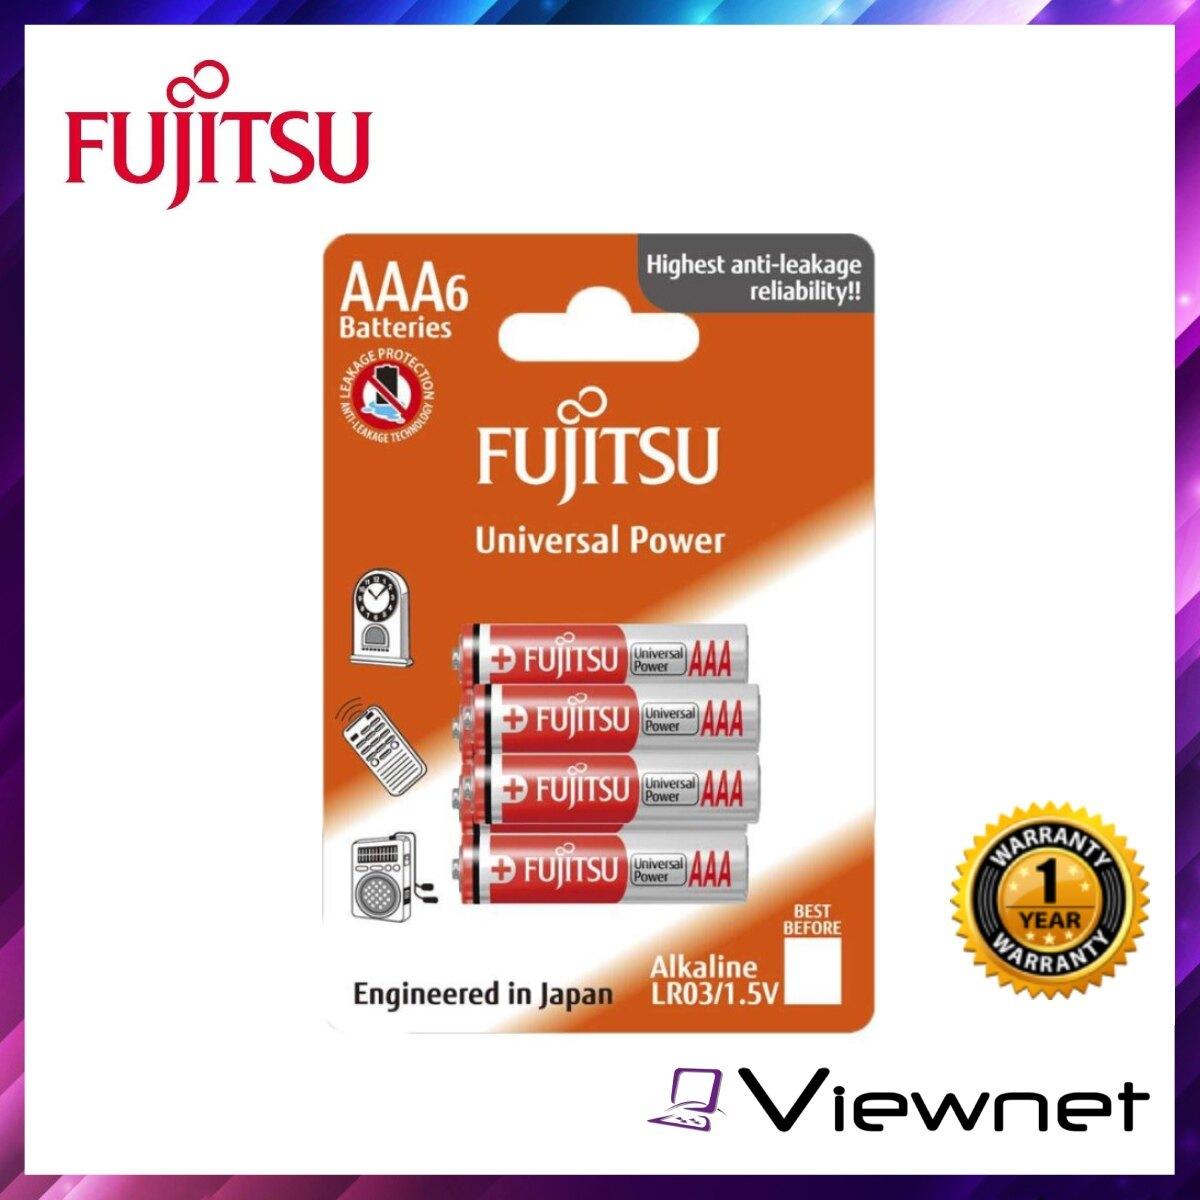 Fujitsu Alkaline Battery Universal Power AAA 6Pcs (LR03(6B)FU-W-FI), Leakage Protection, Anti Corrosion